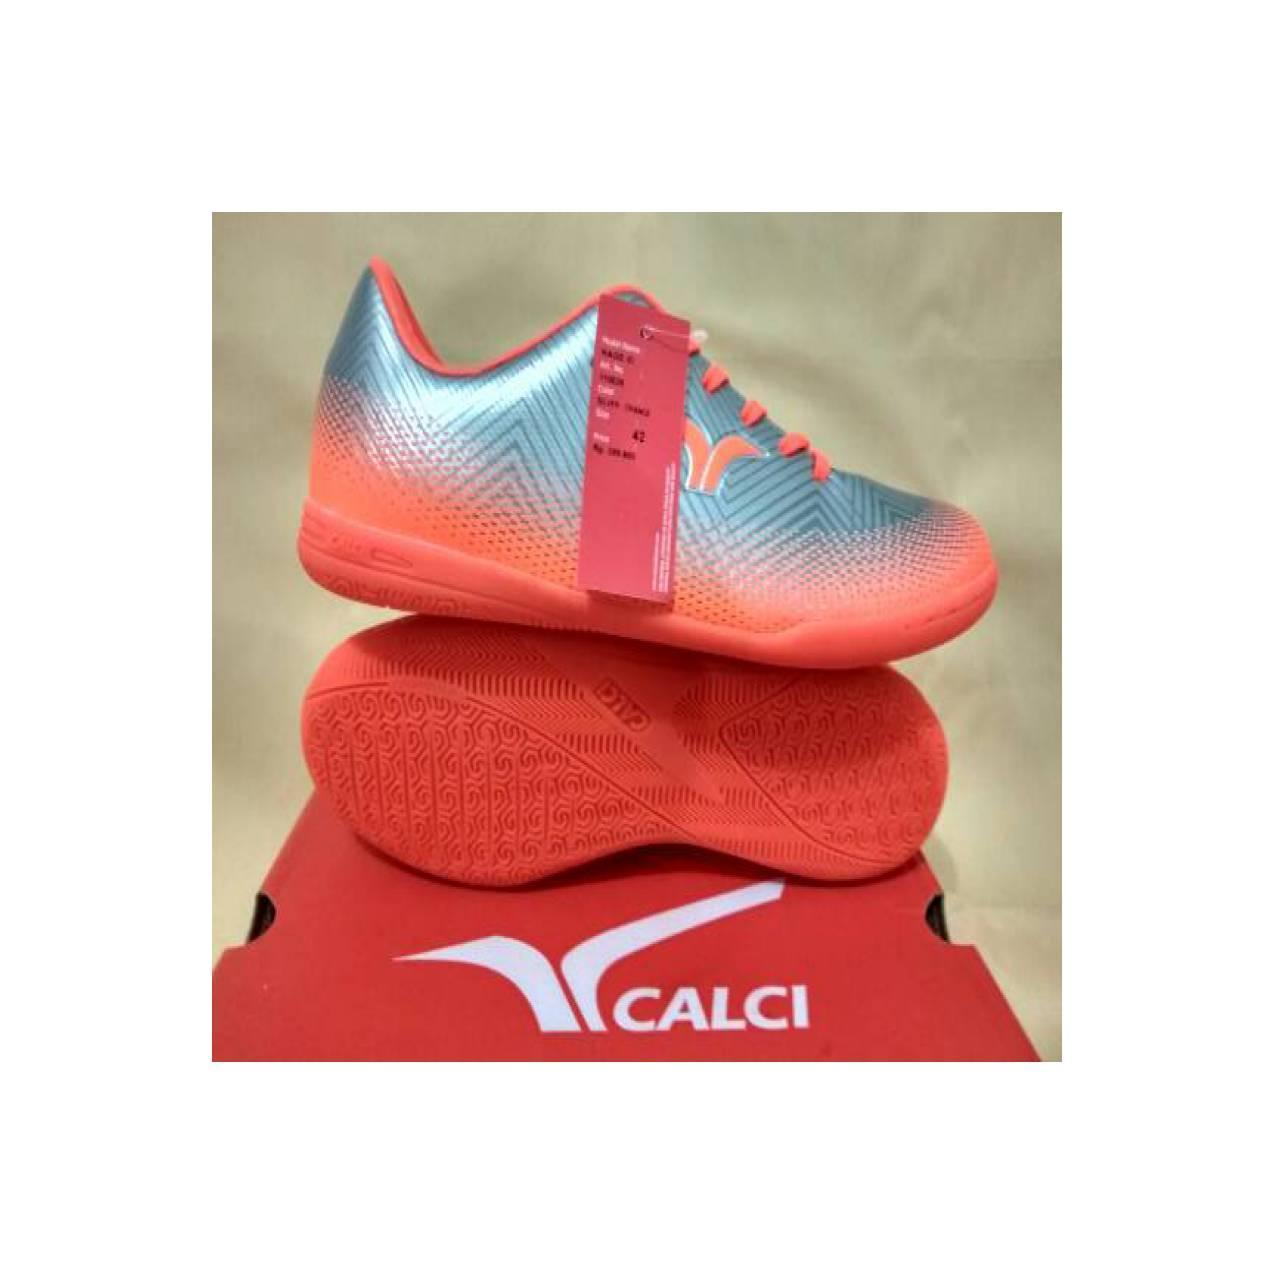 Sepatu Futsal Calci Rage silver